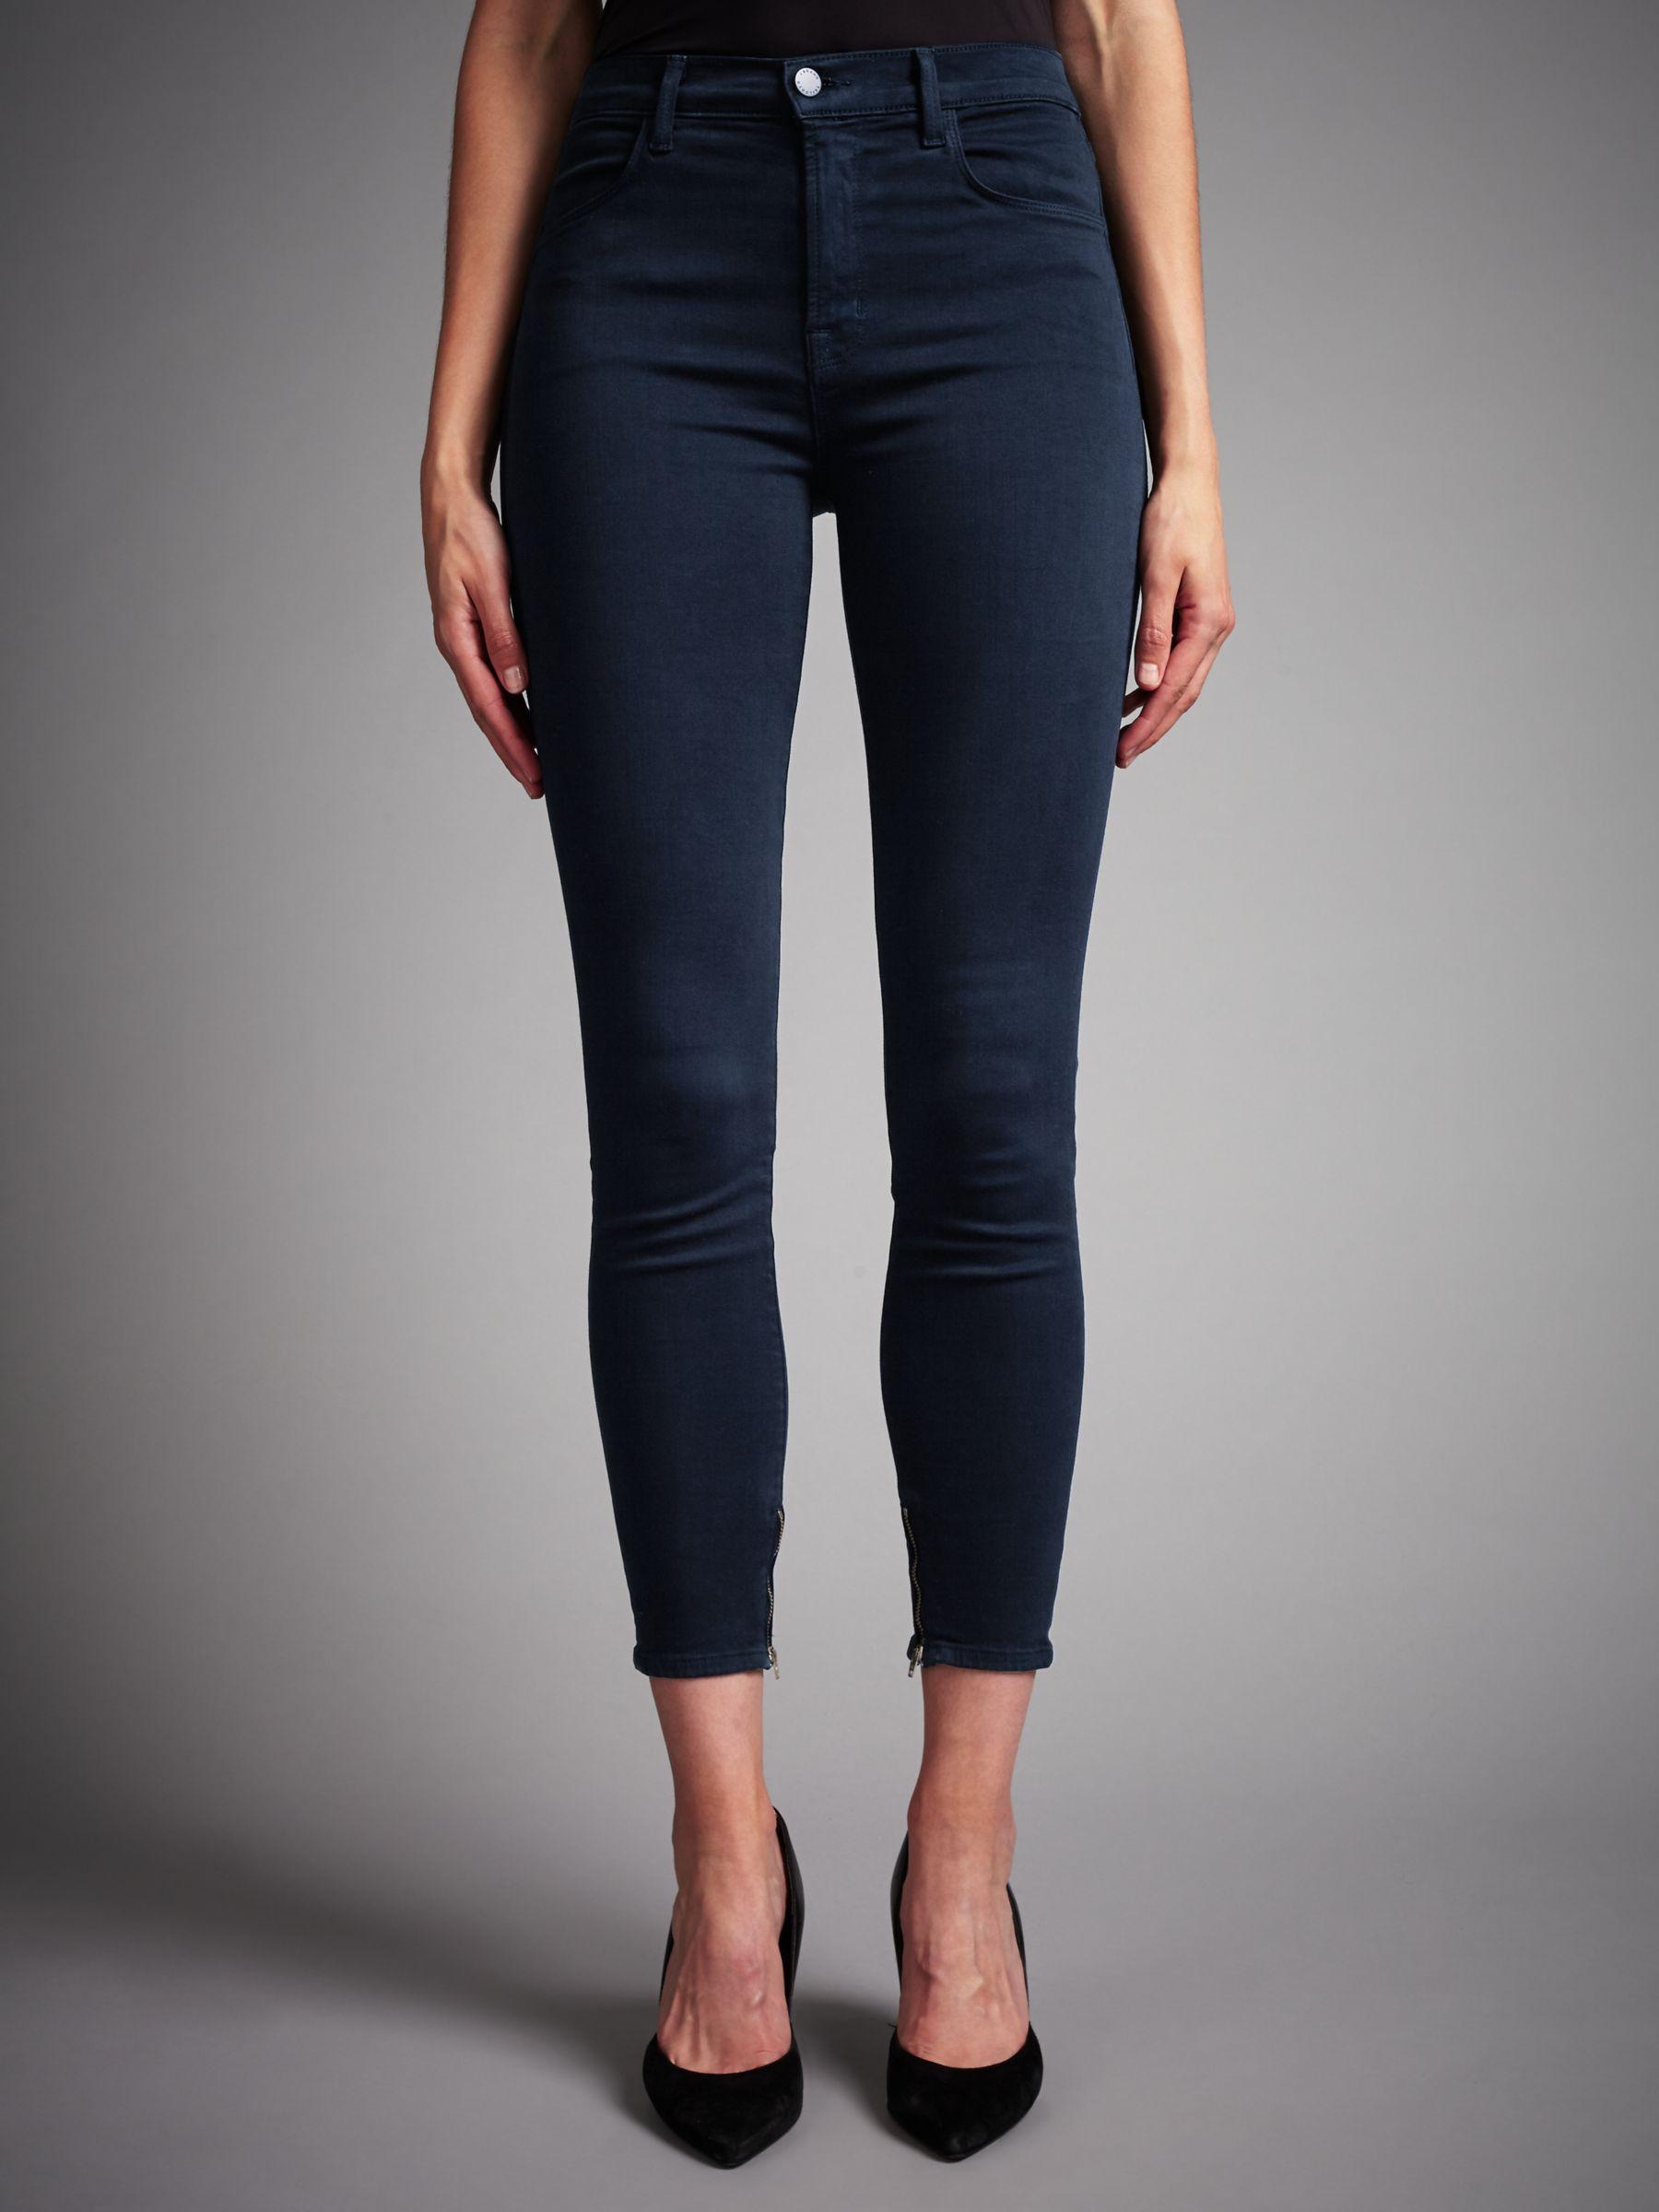 J Brand J Brand Maria High Rise Ankle Crop Skinny Jeans, Direct Blue Black